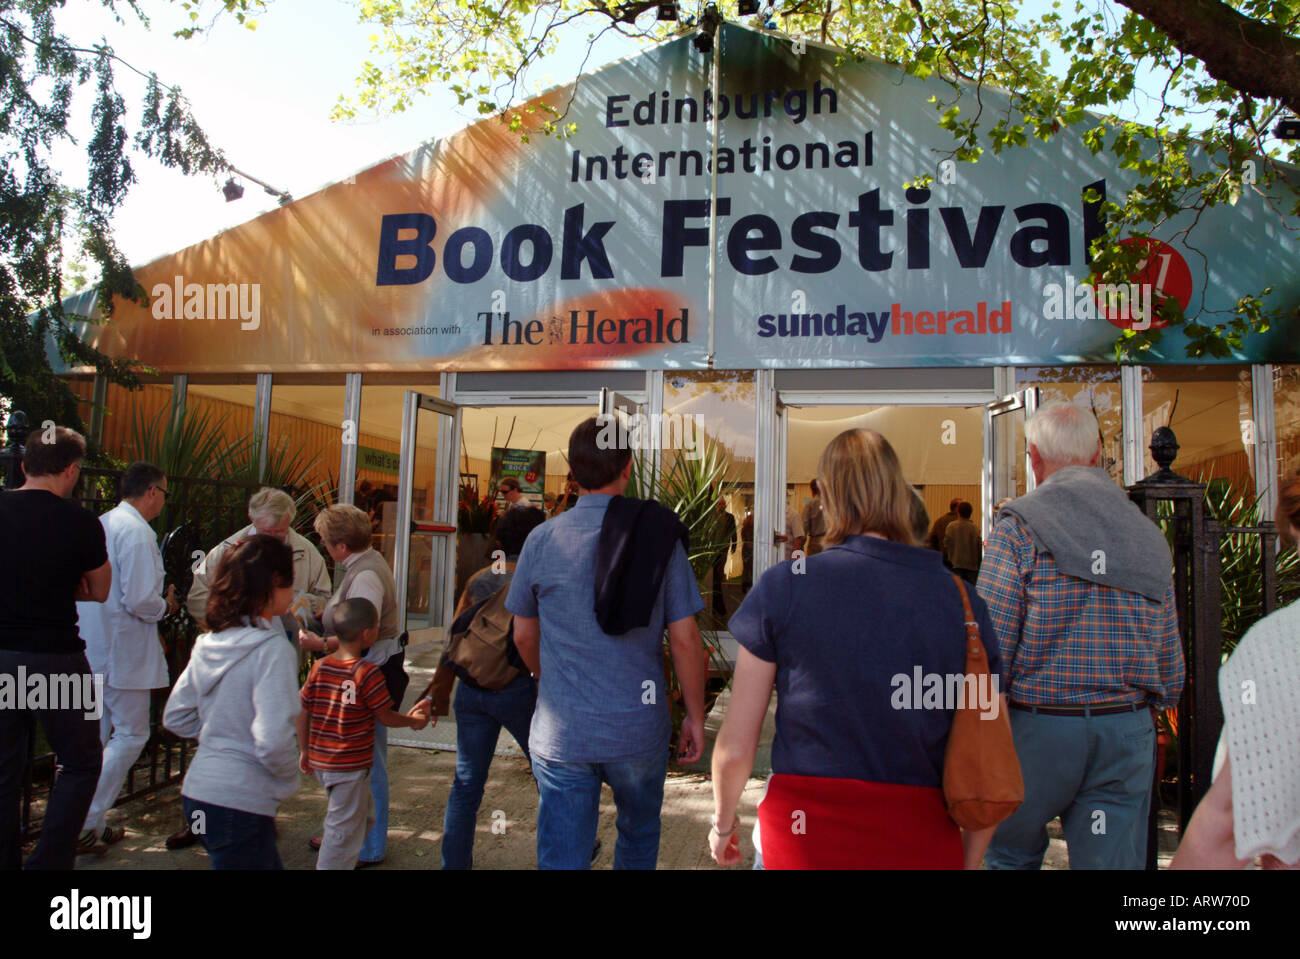 Book Festival Edinburgh - Stock Image